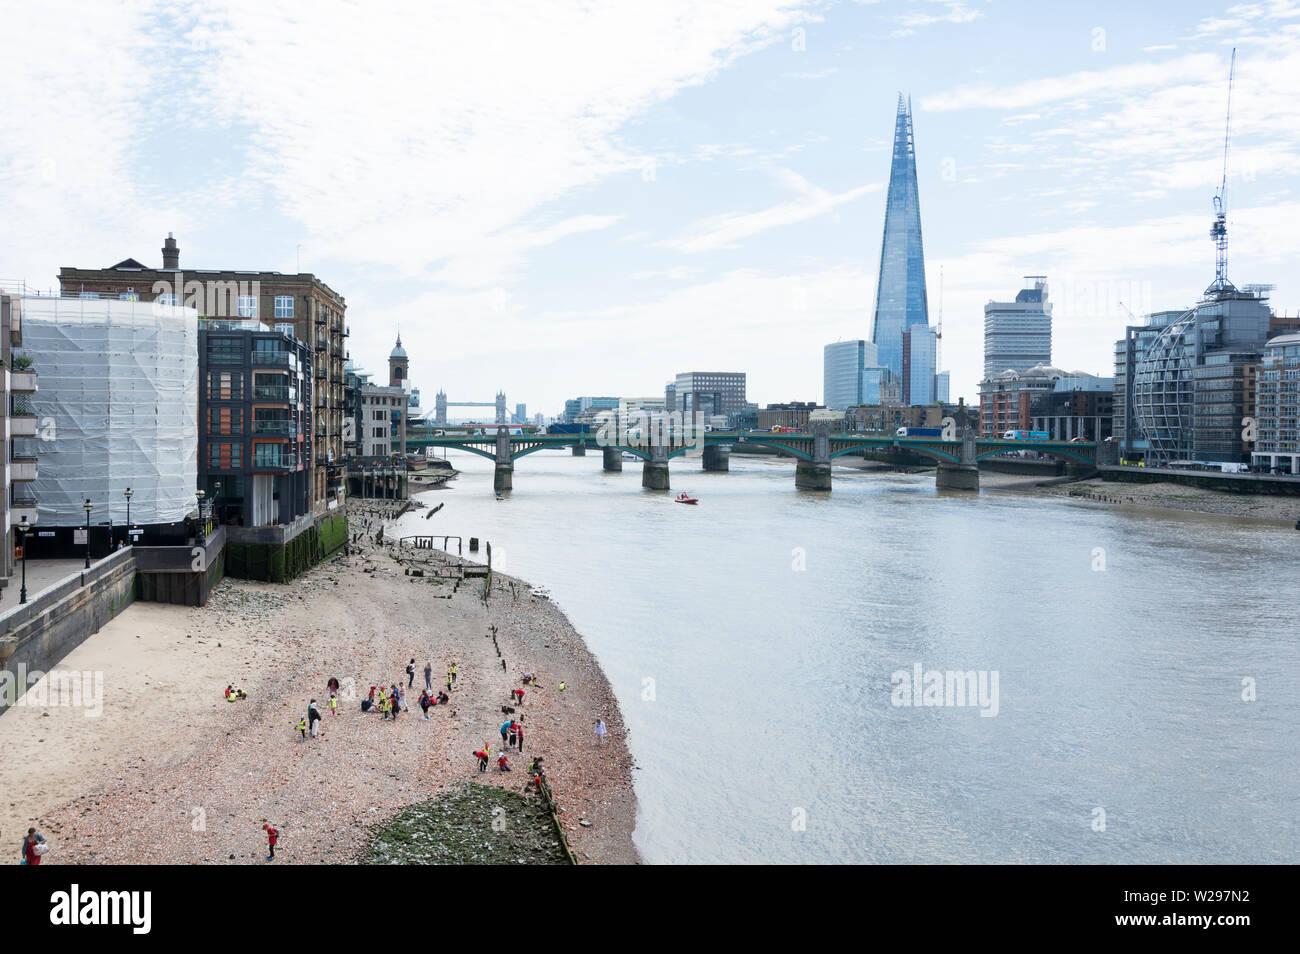 Mudlarking school trip to Thames foreshore, City of London, UK Stock Photo